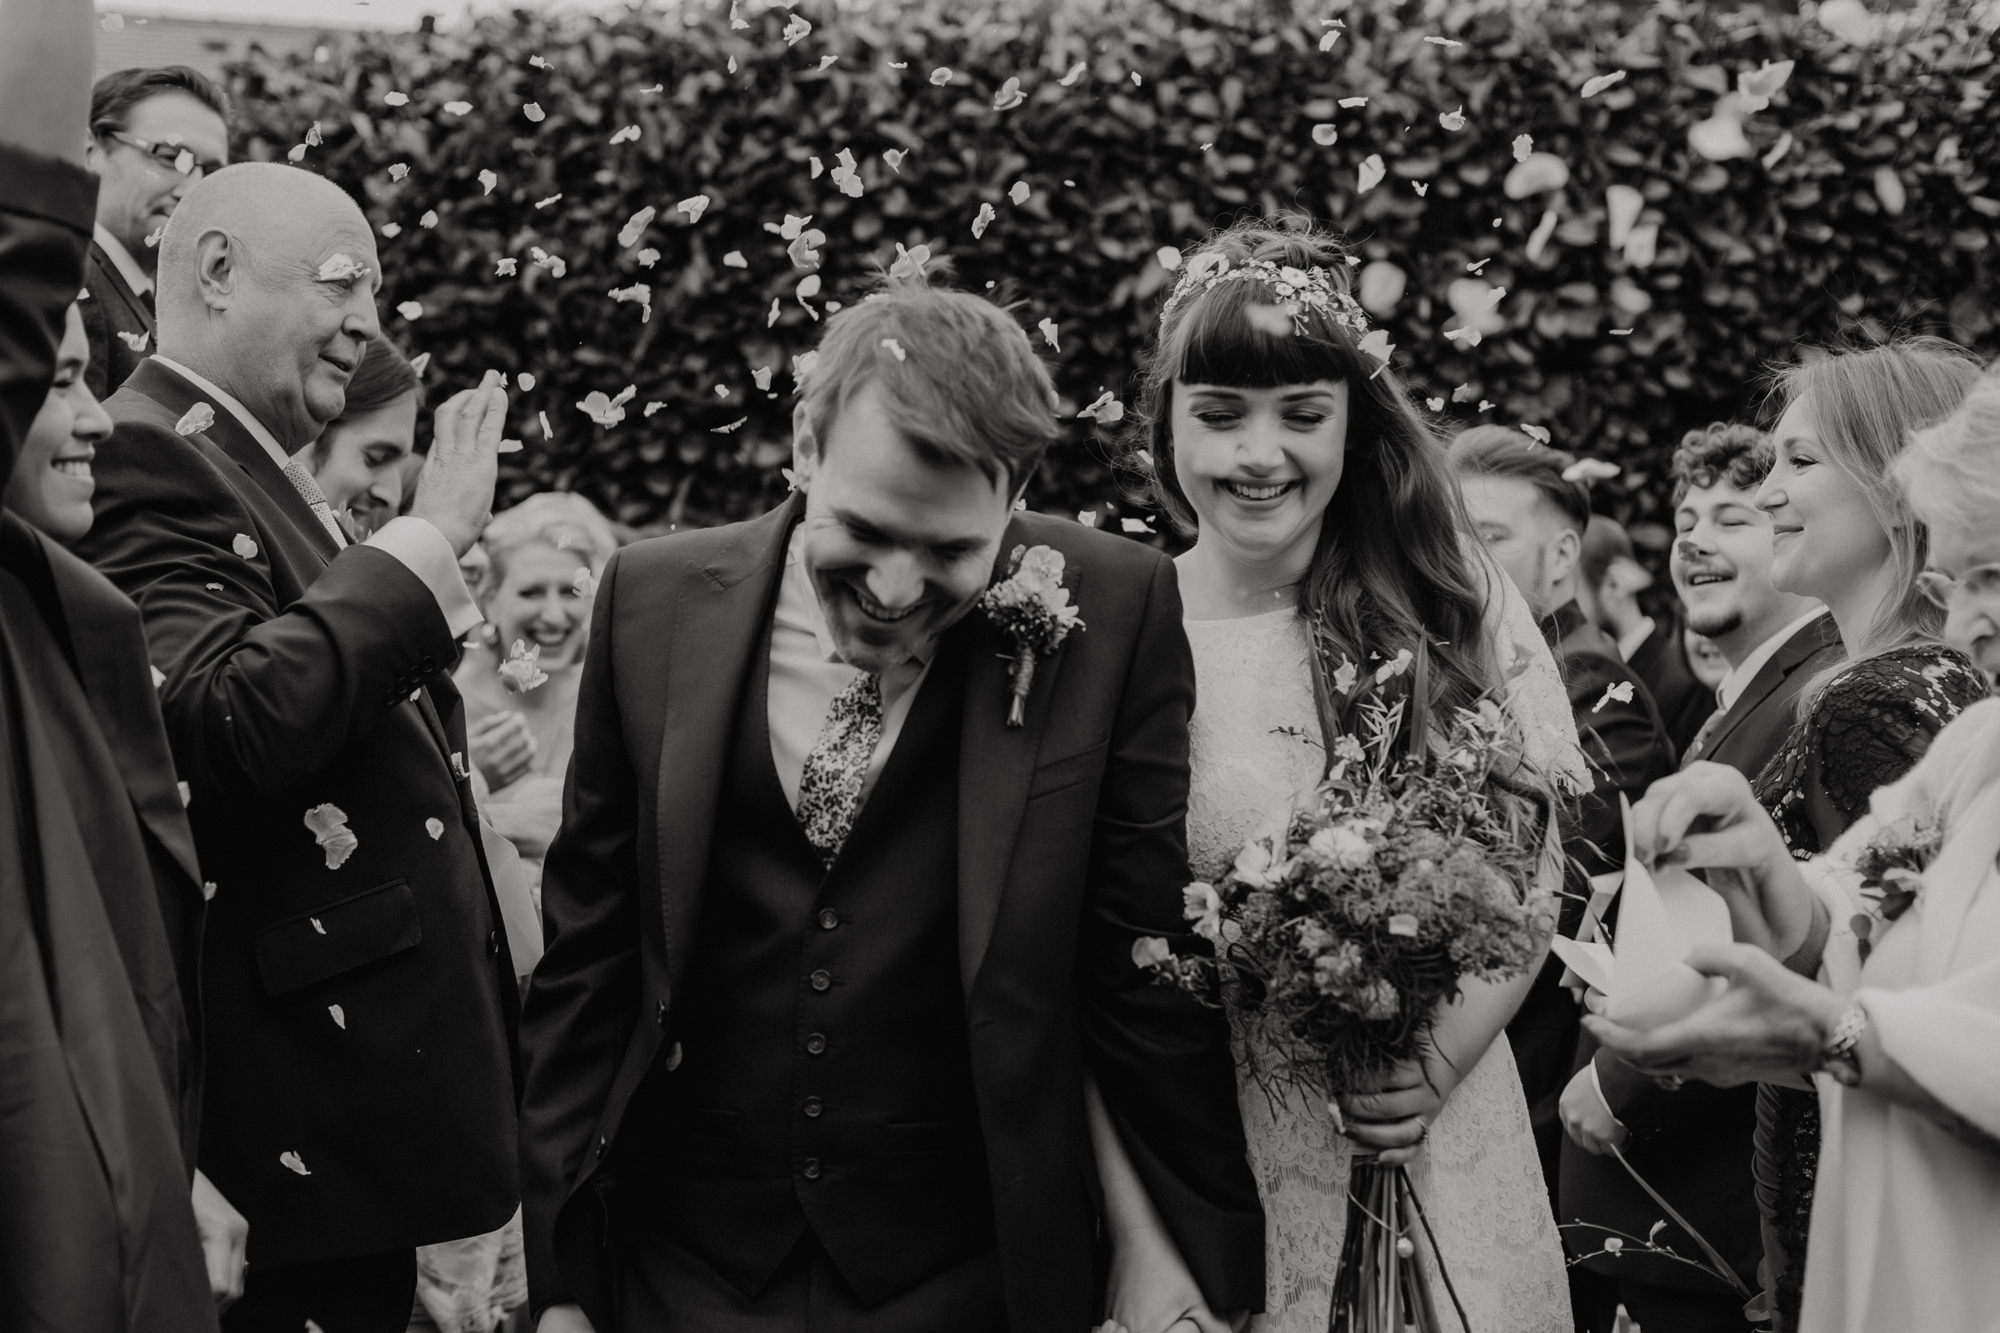 Kristy-Back-Garden-Outdoor-Wedding-Sheffield-Industrial-Warehouse-Wedding-Bohemian-Kate-Beaumont-Dahlia-Dress-21.jpg